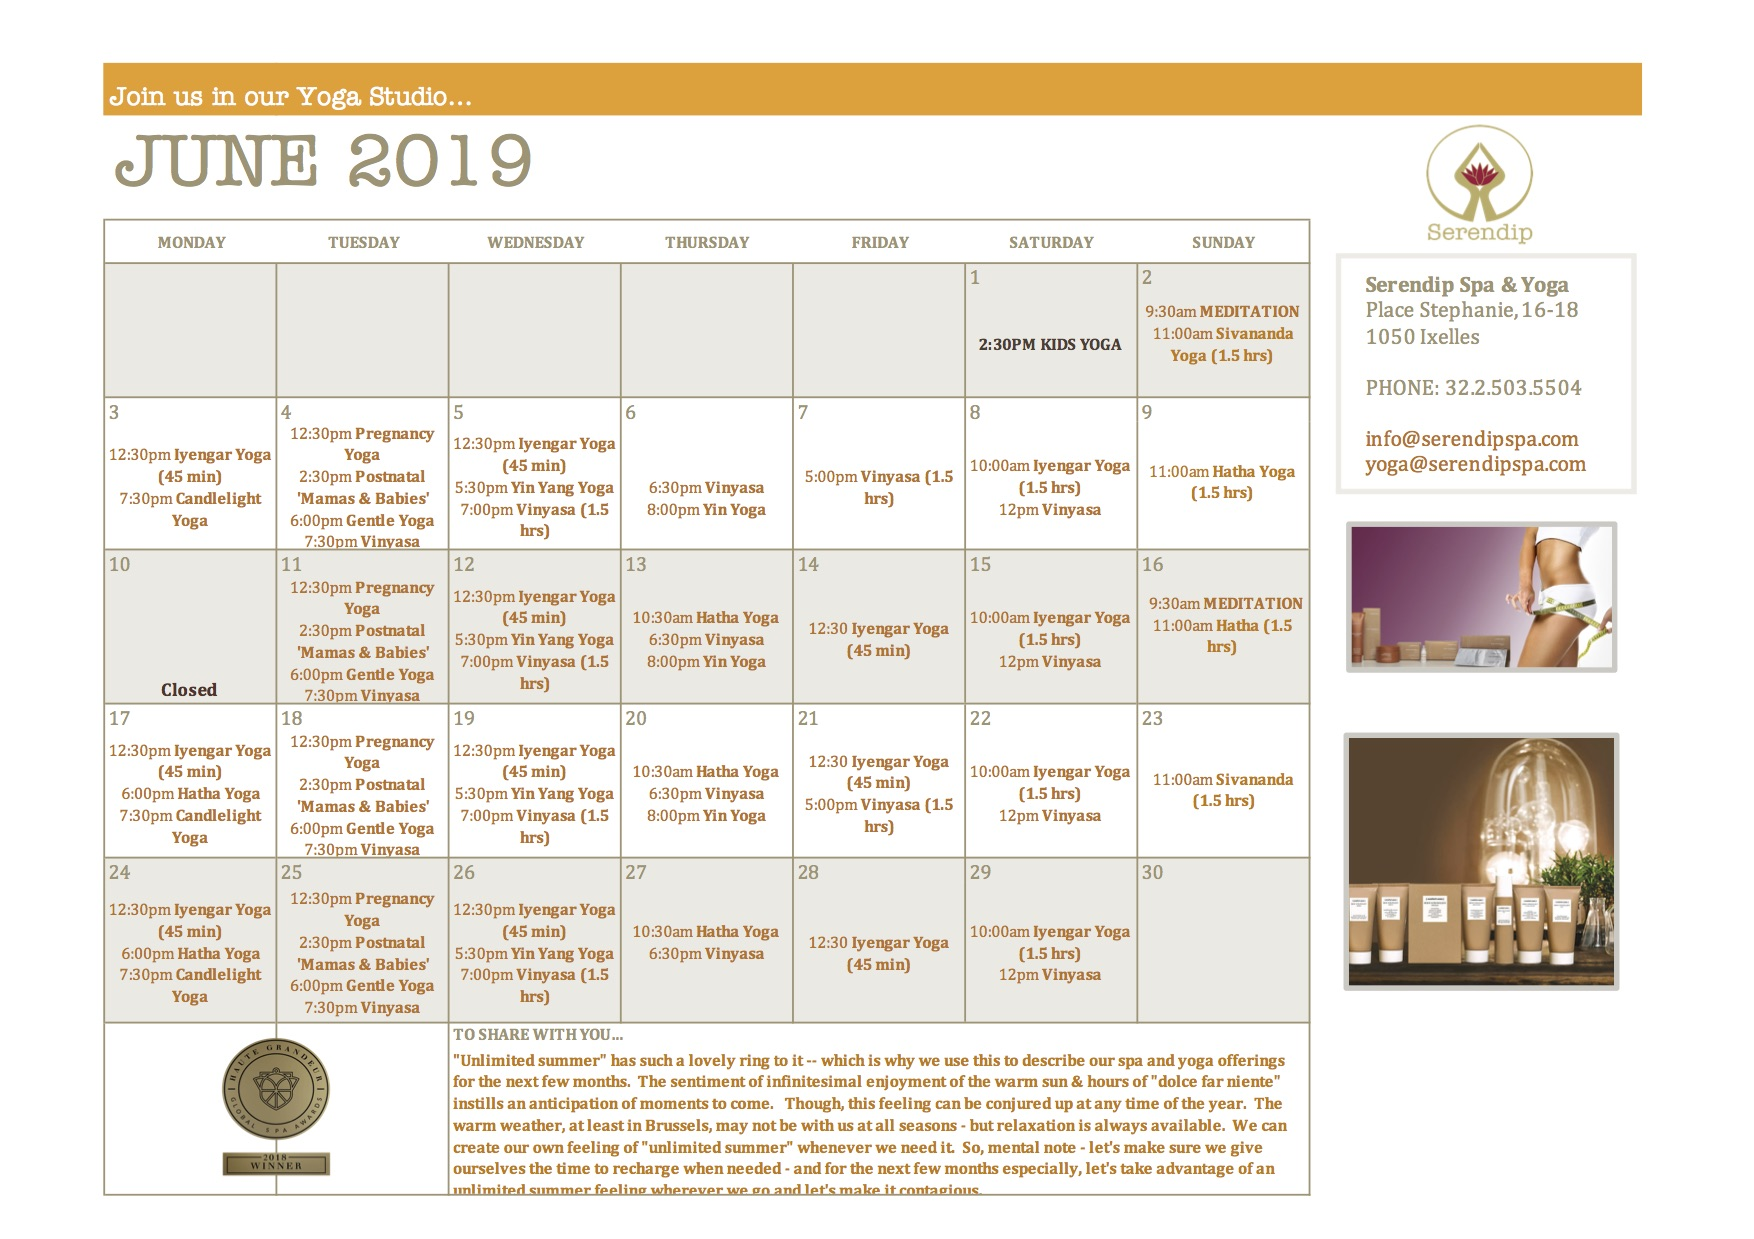 serendip spa and yoga calendar 2019_June A4 FRONT.jpg